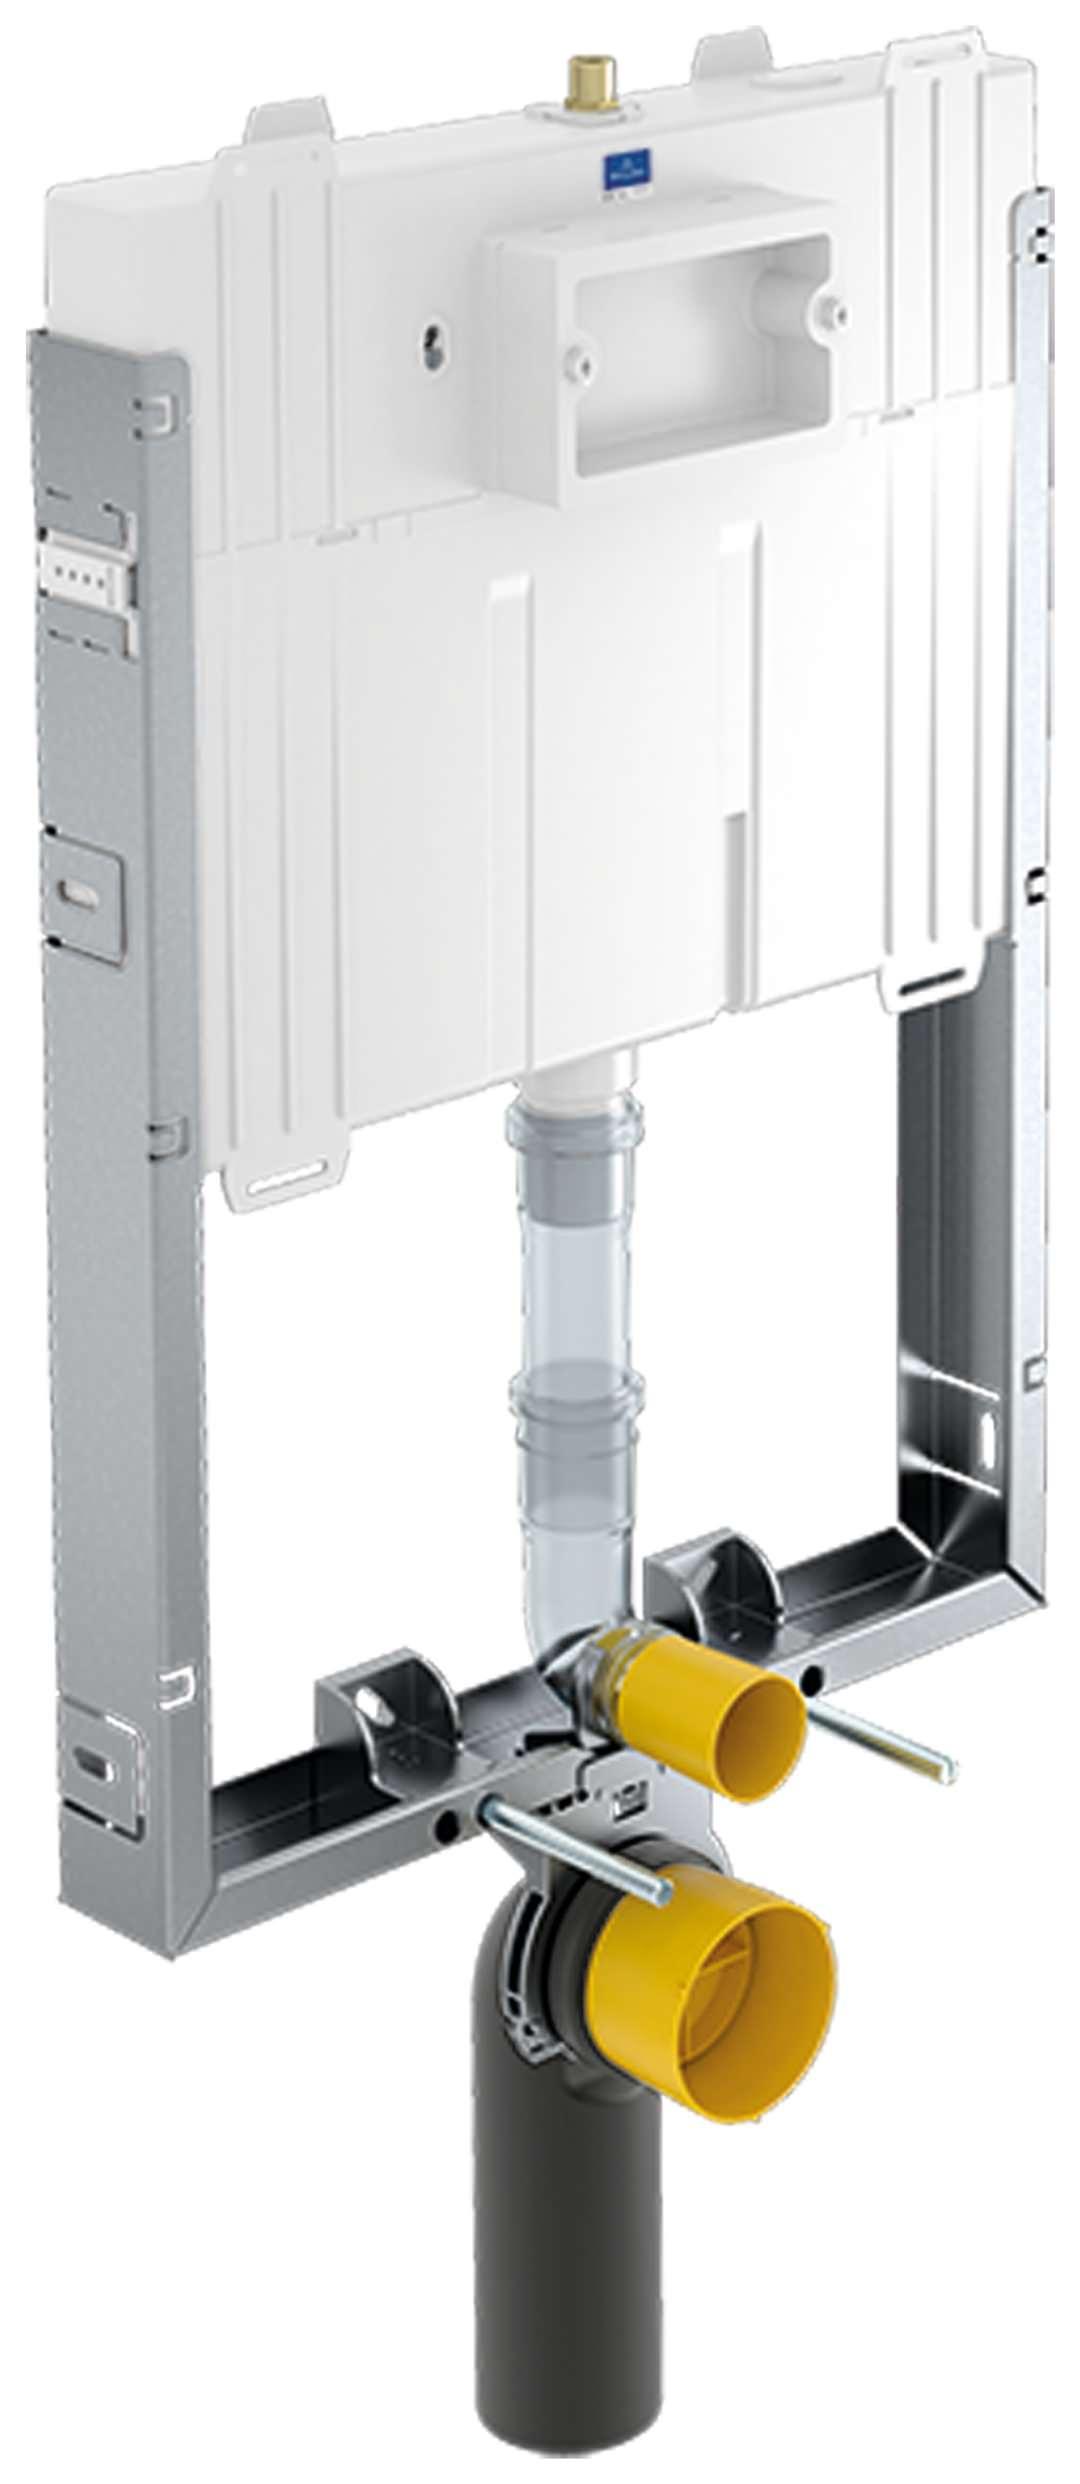 villeroy boch viconnect vorwandelement wc element compact f r nassbau bet tigung von vorne. Black Bedroom Furniture Sets. Home Design Ideas